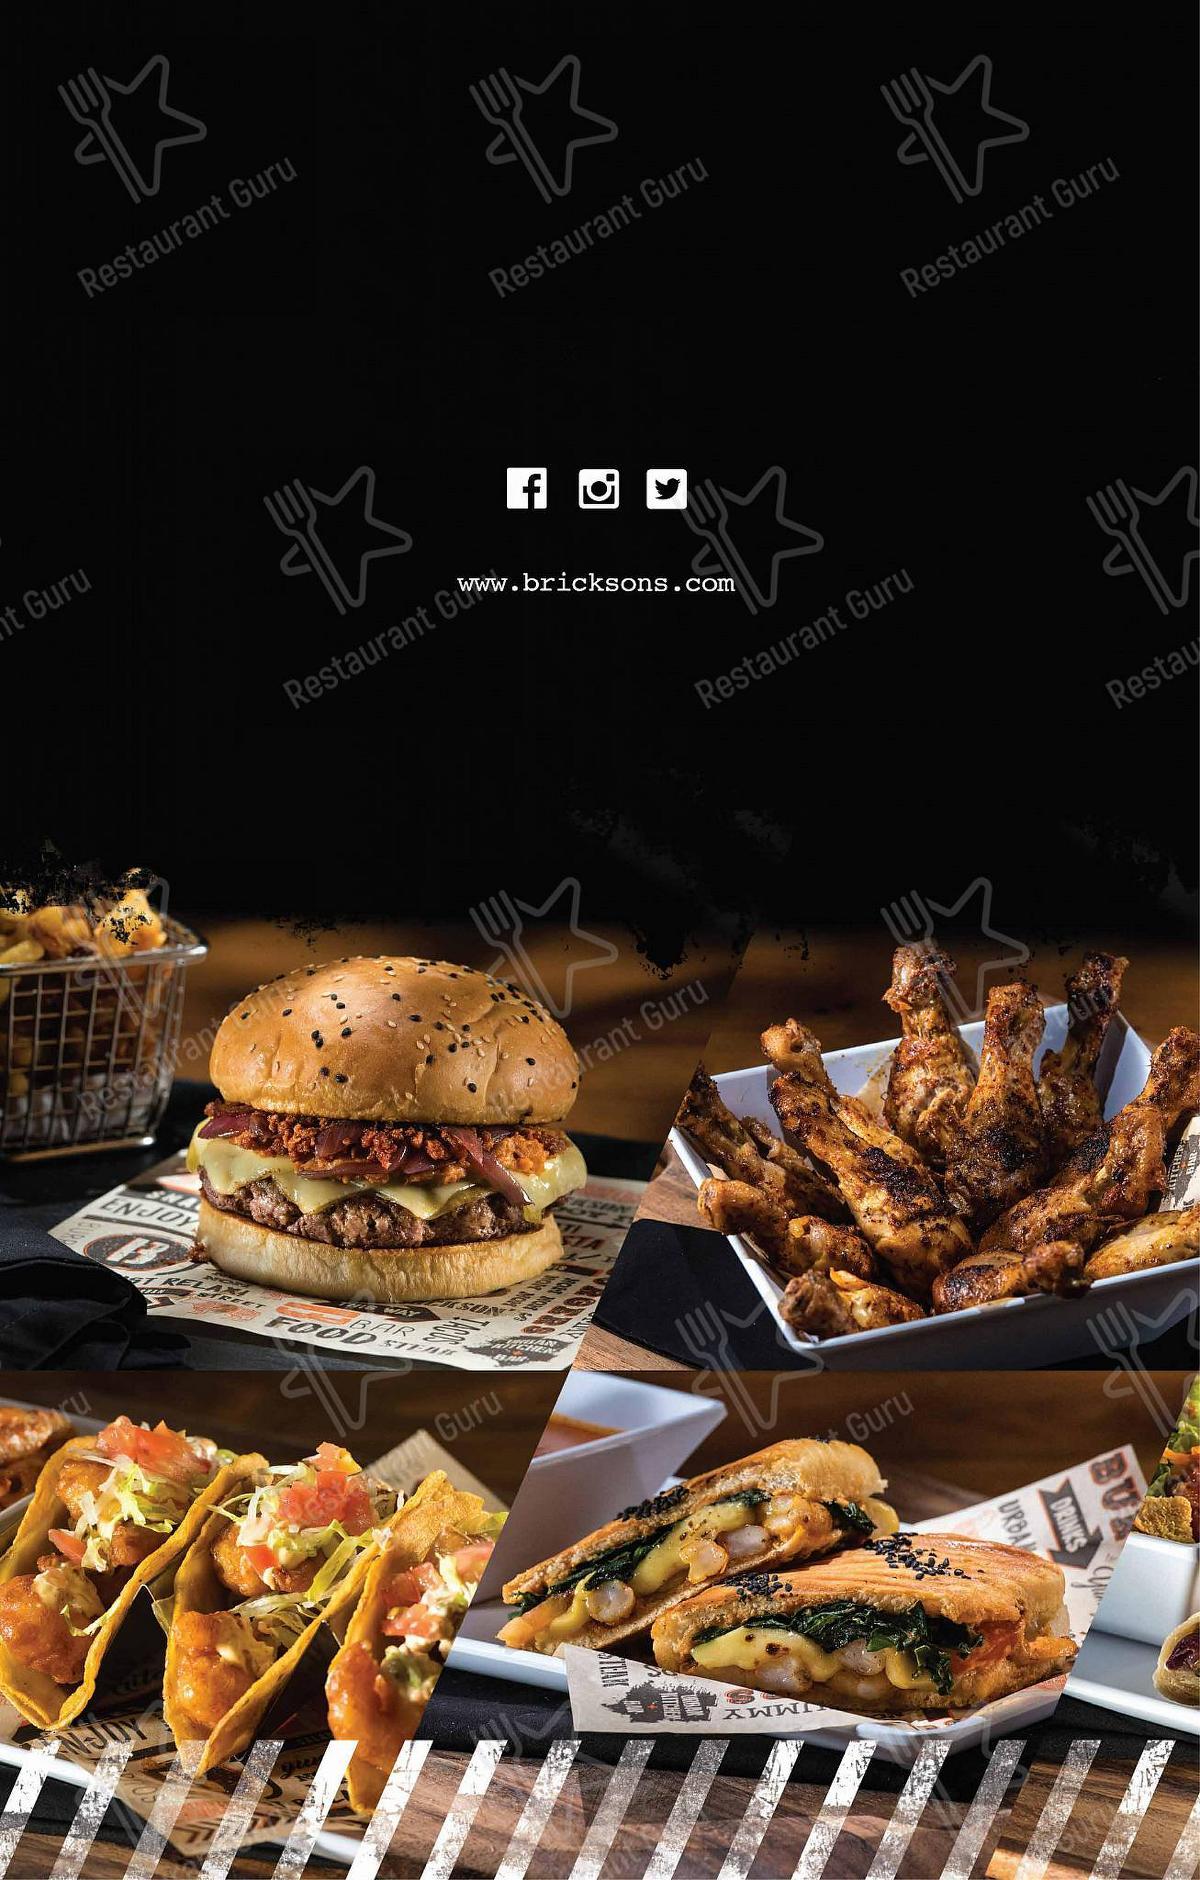 Mira la carta de Brickson's Urban Kitchen + Bar